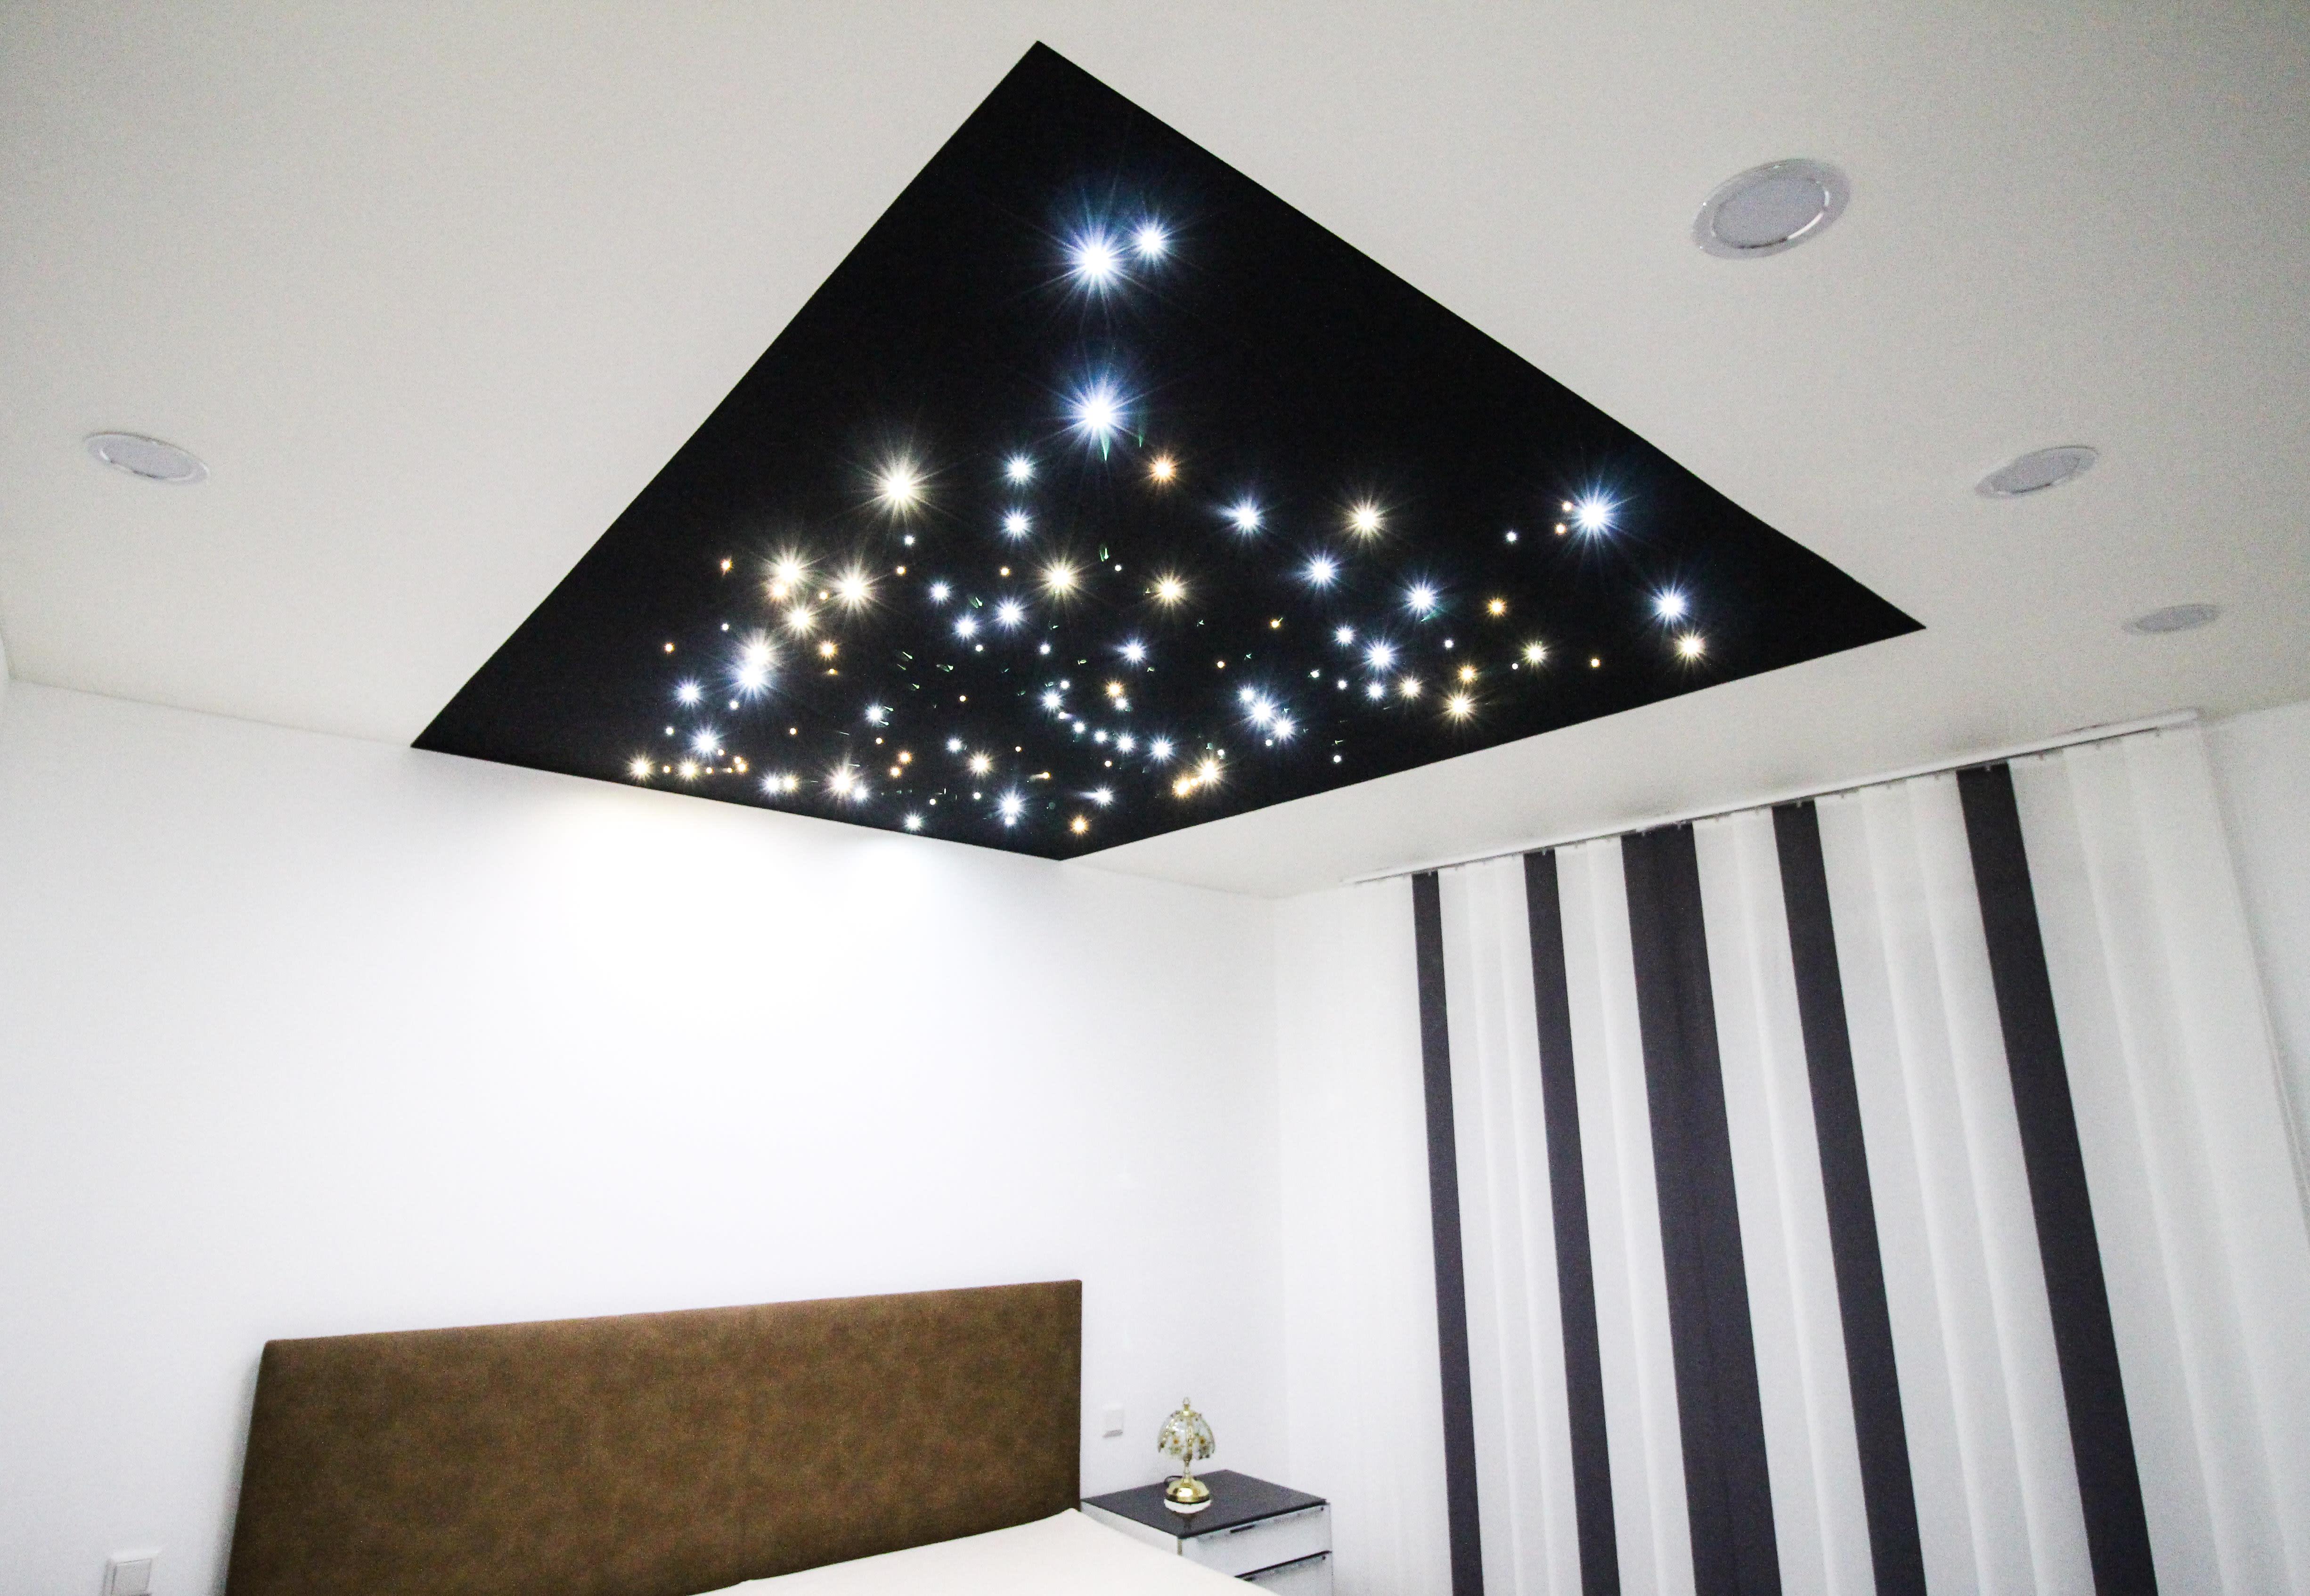 Spanndecke gestaltet mit LEDs in Optik eines Sternenhimmels